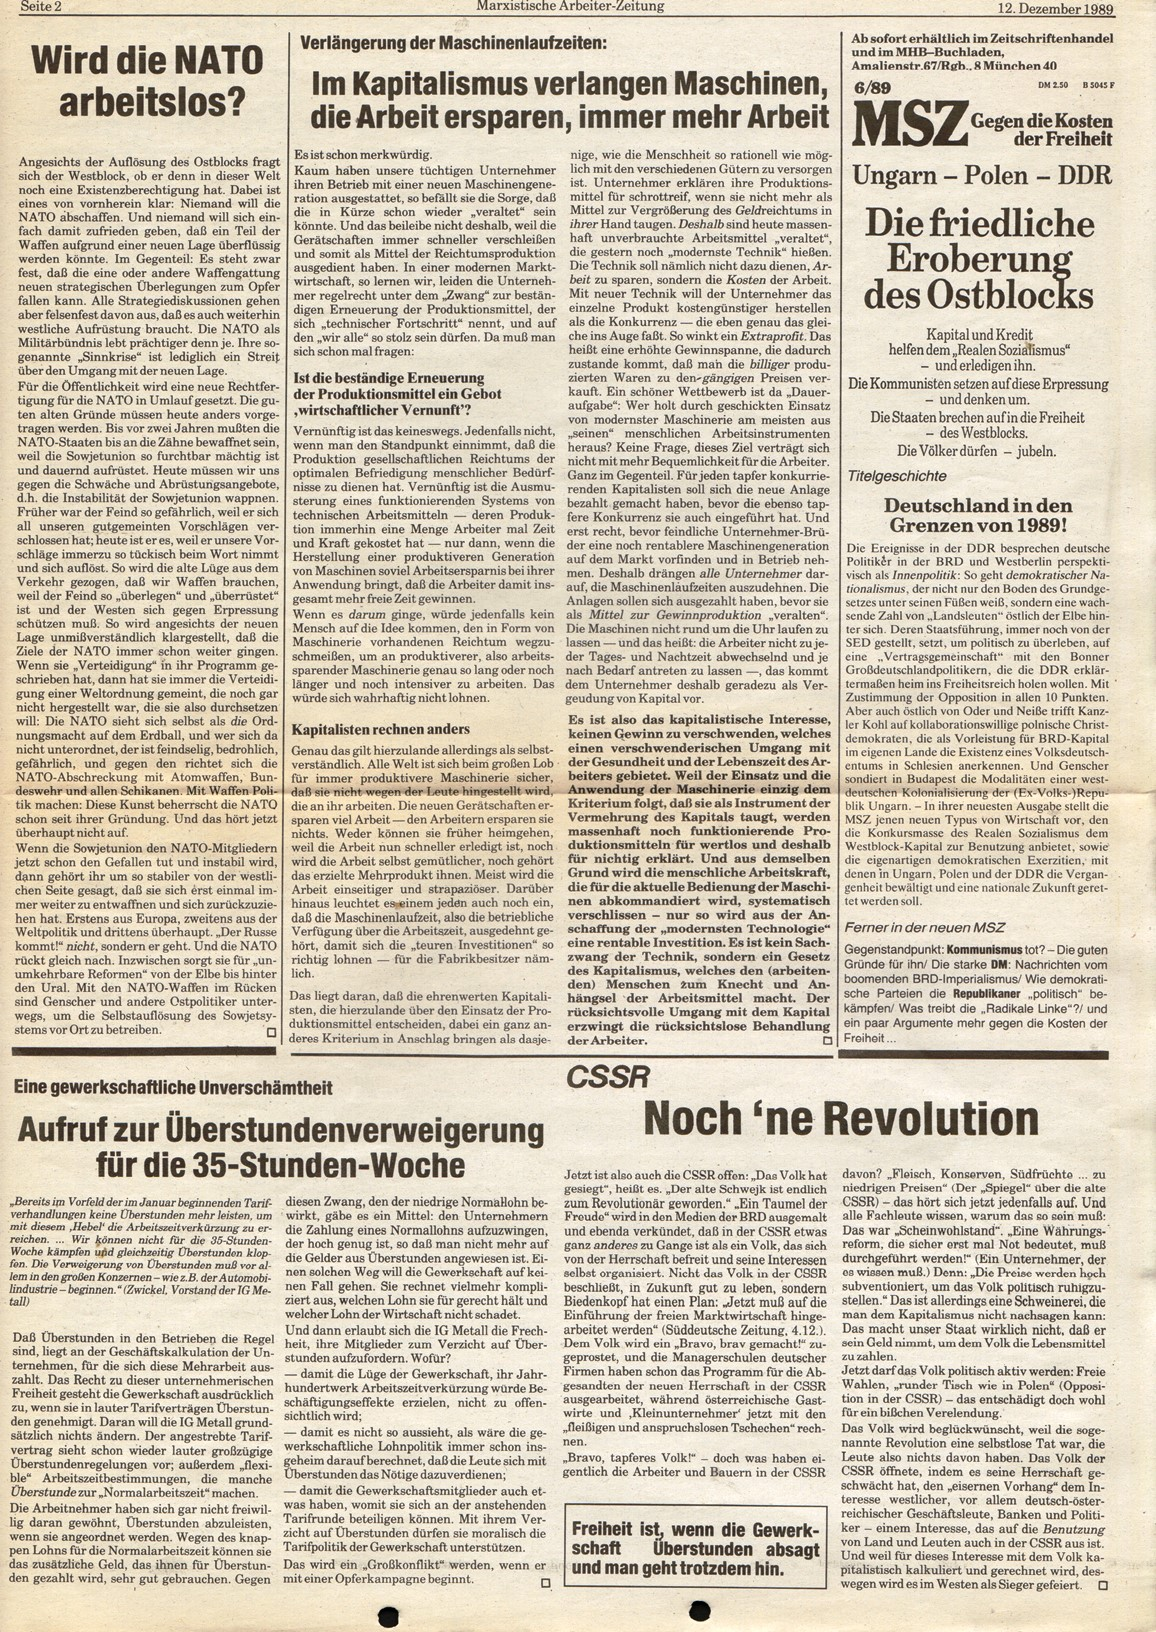 Muenchen_MG_MAZ_19891212_02